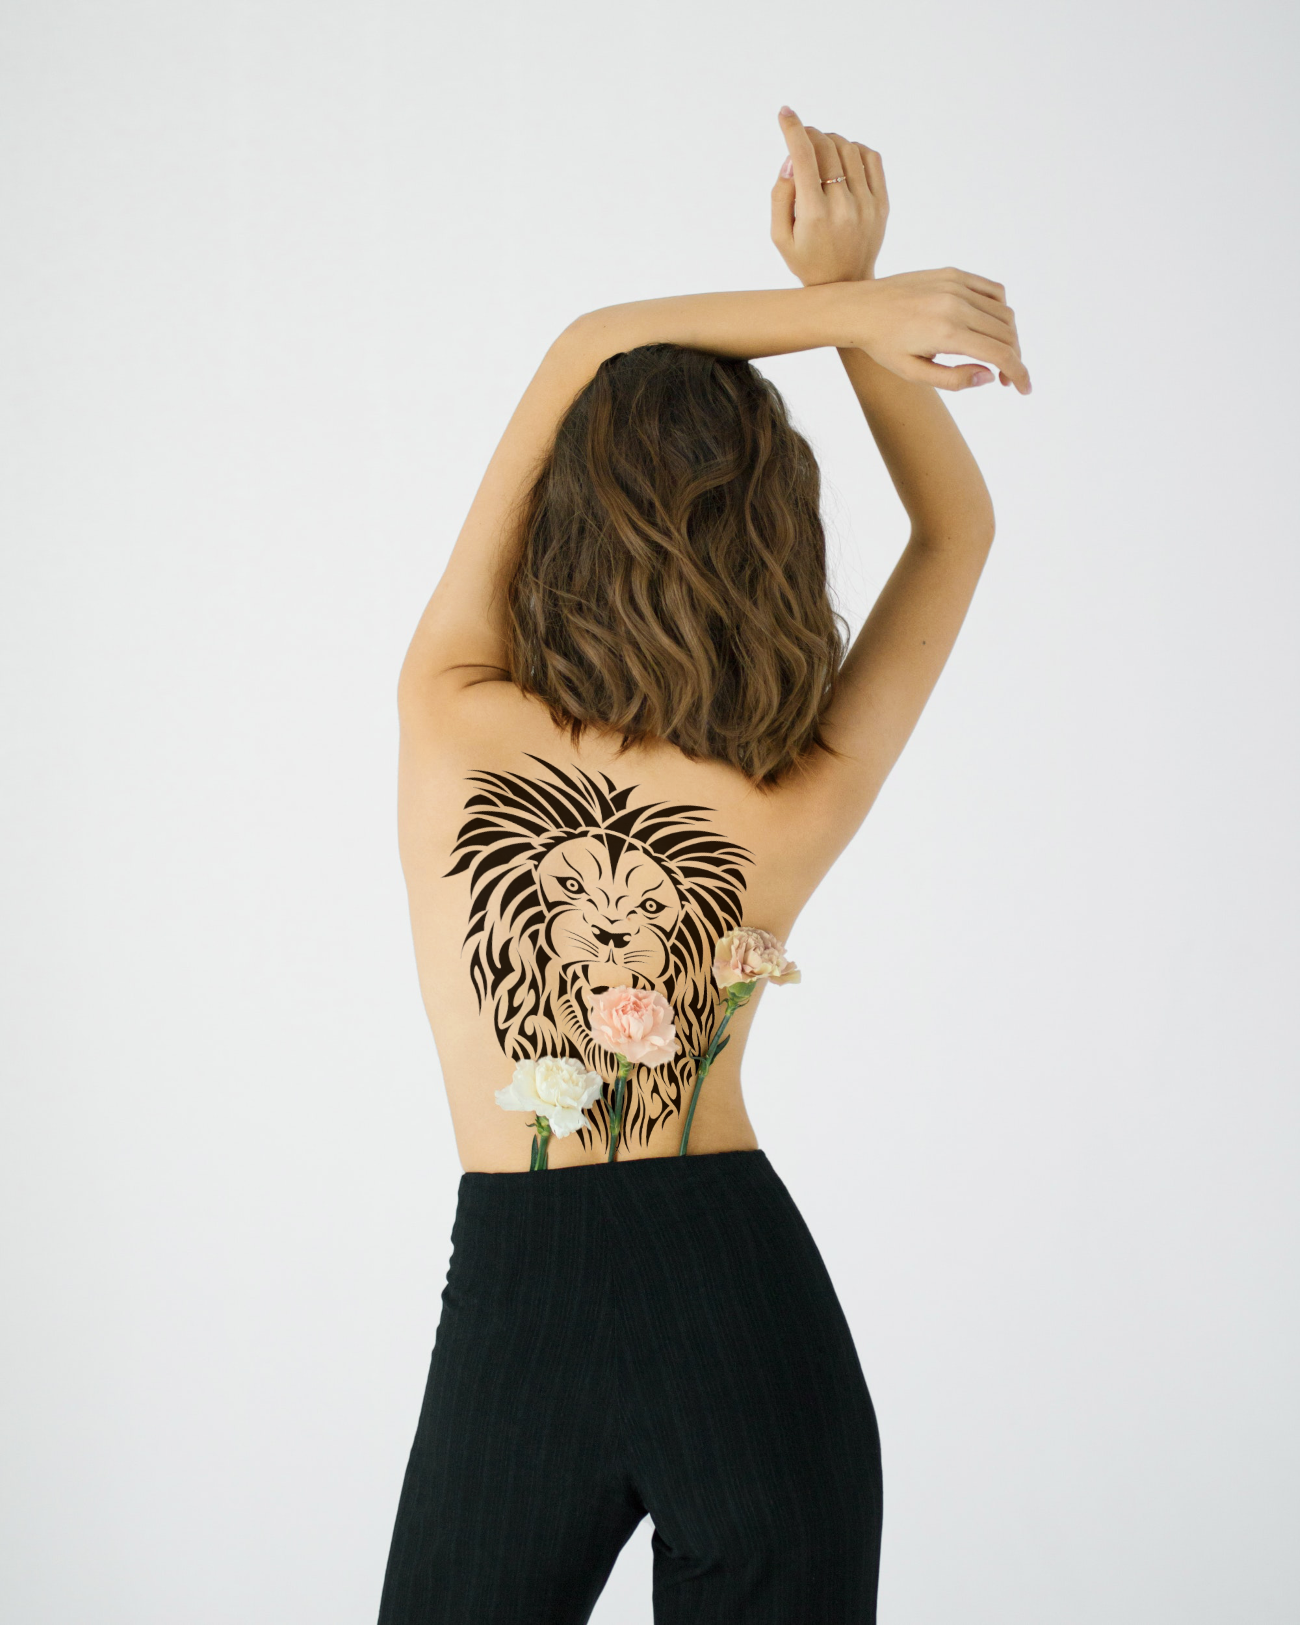 Women's back tattoo mockup